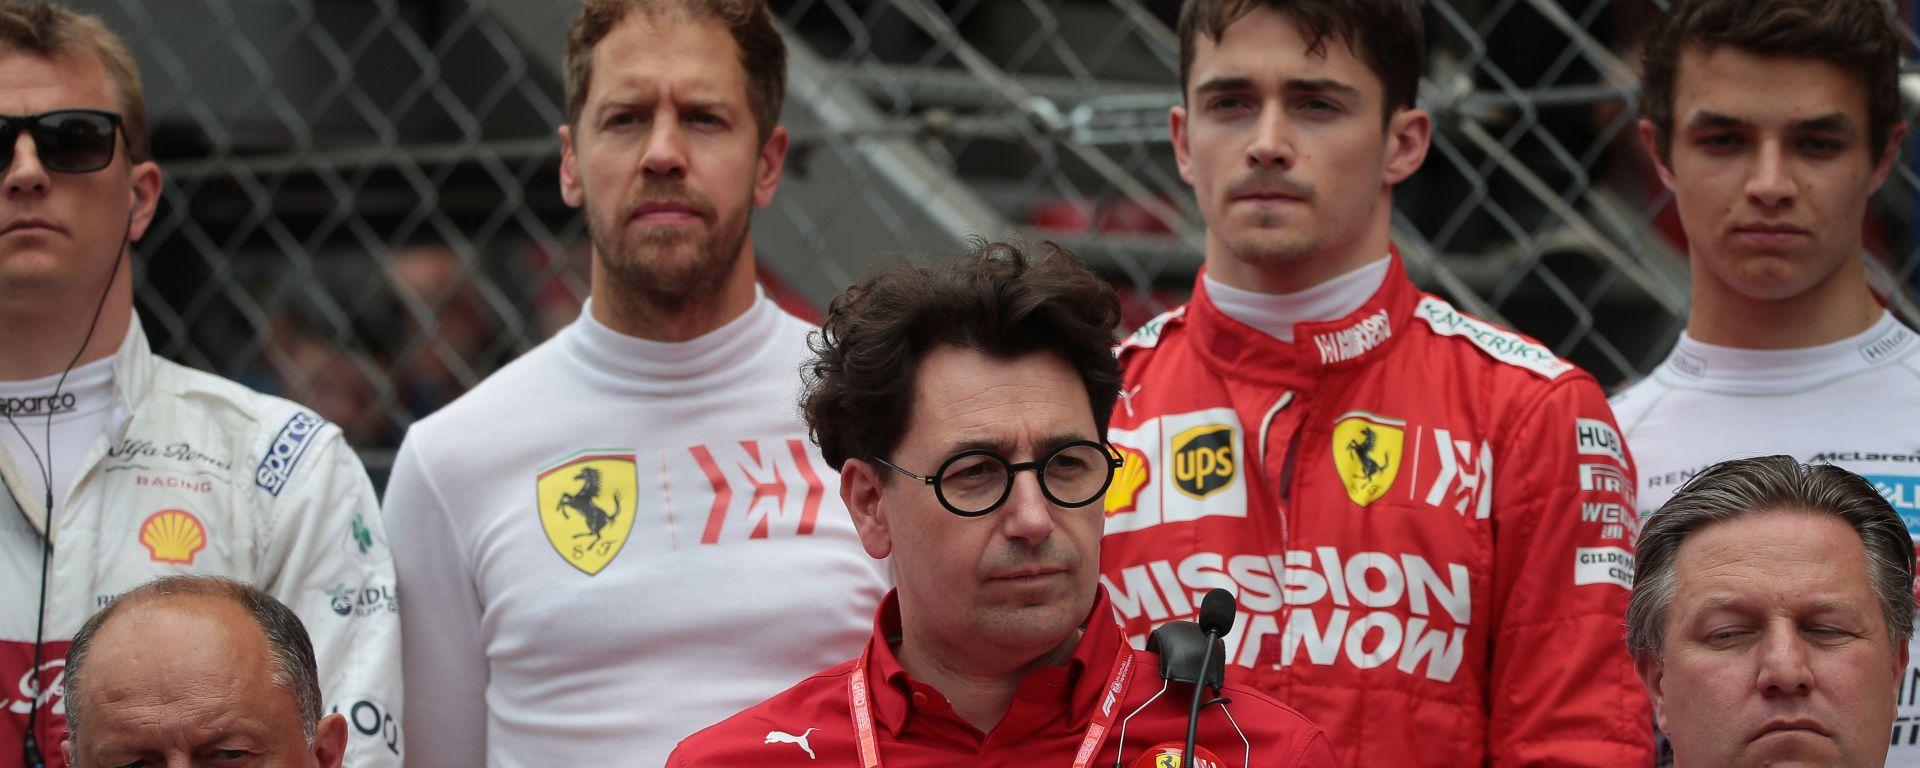 "Monaco, Binotto: ""Bene Vettel, Leclerc giusta attitudine"""